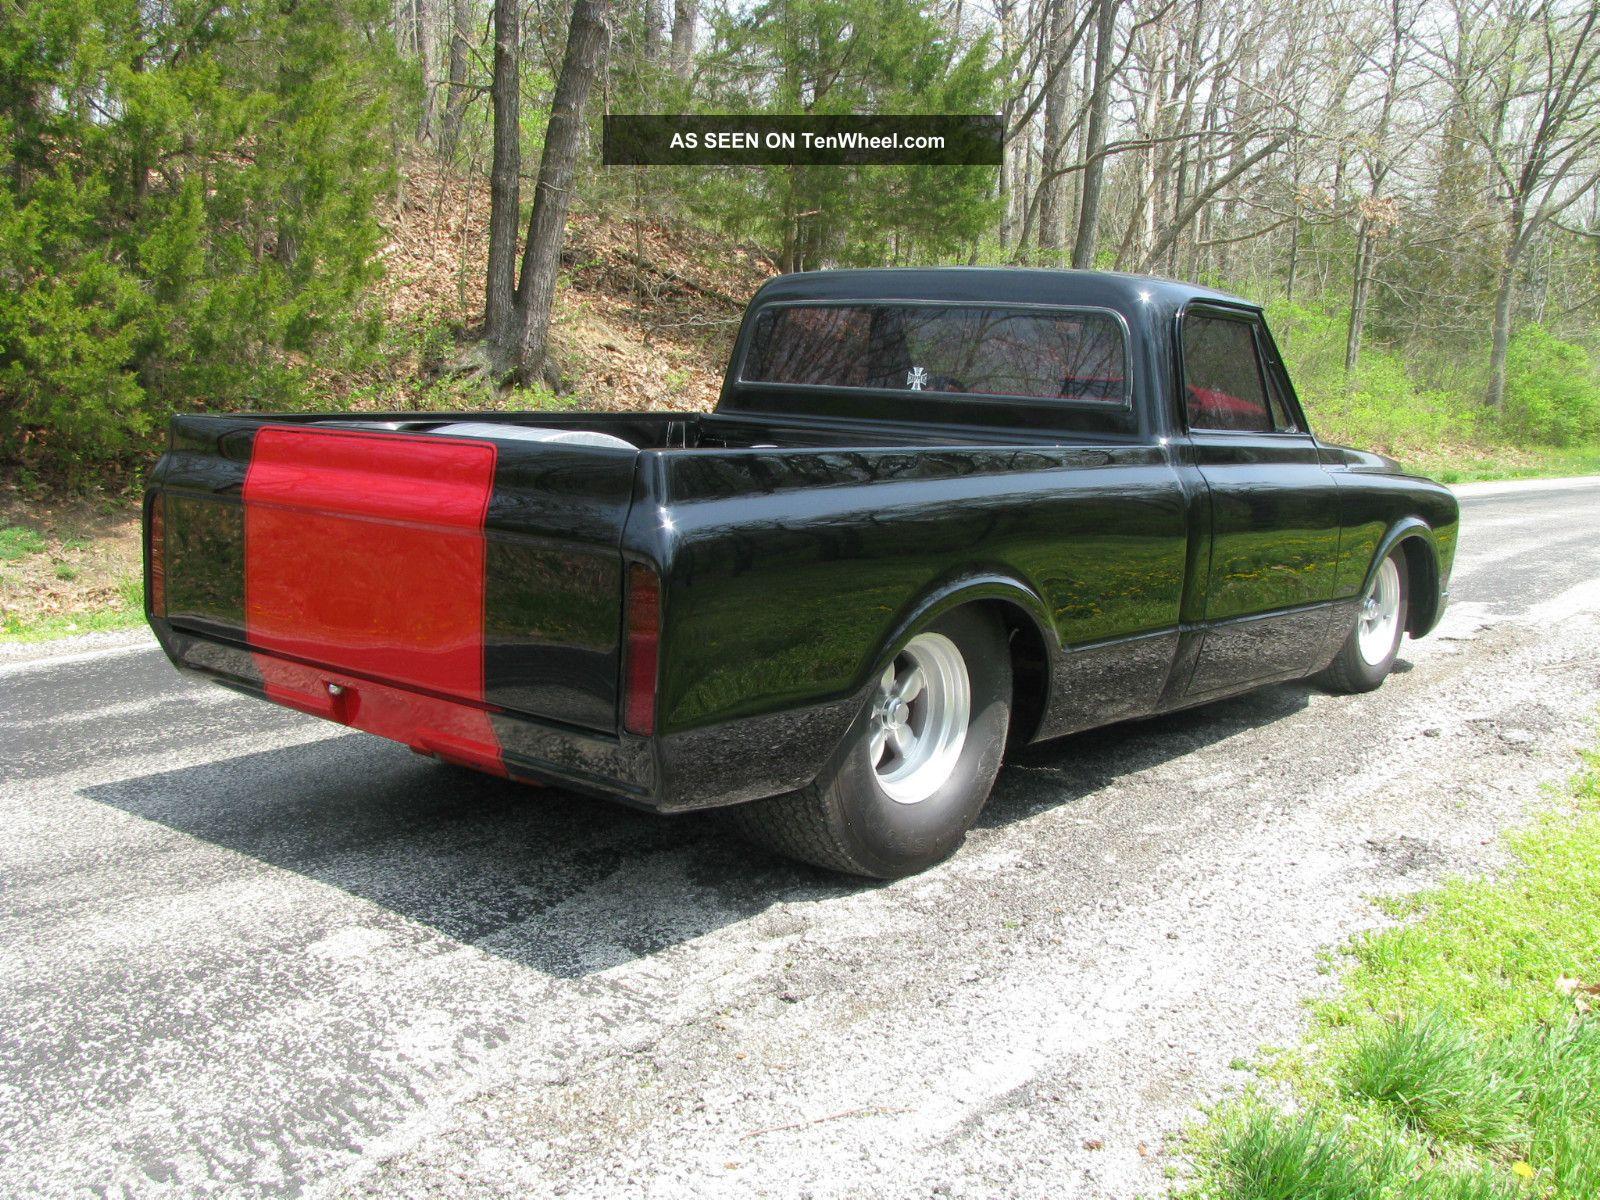 1972 Chevy / Gmc Pro Street Truck 67 68 69 70 71 72 C10 C-10 photo 4